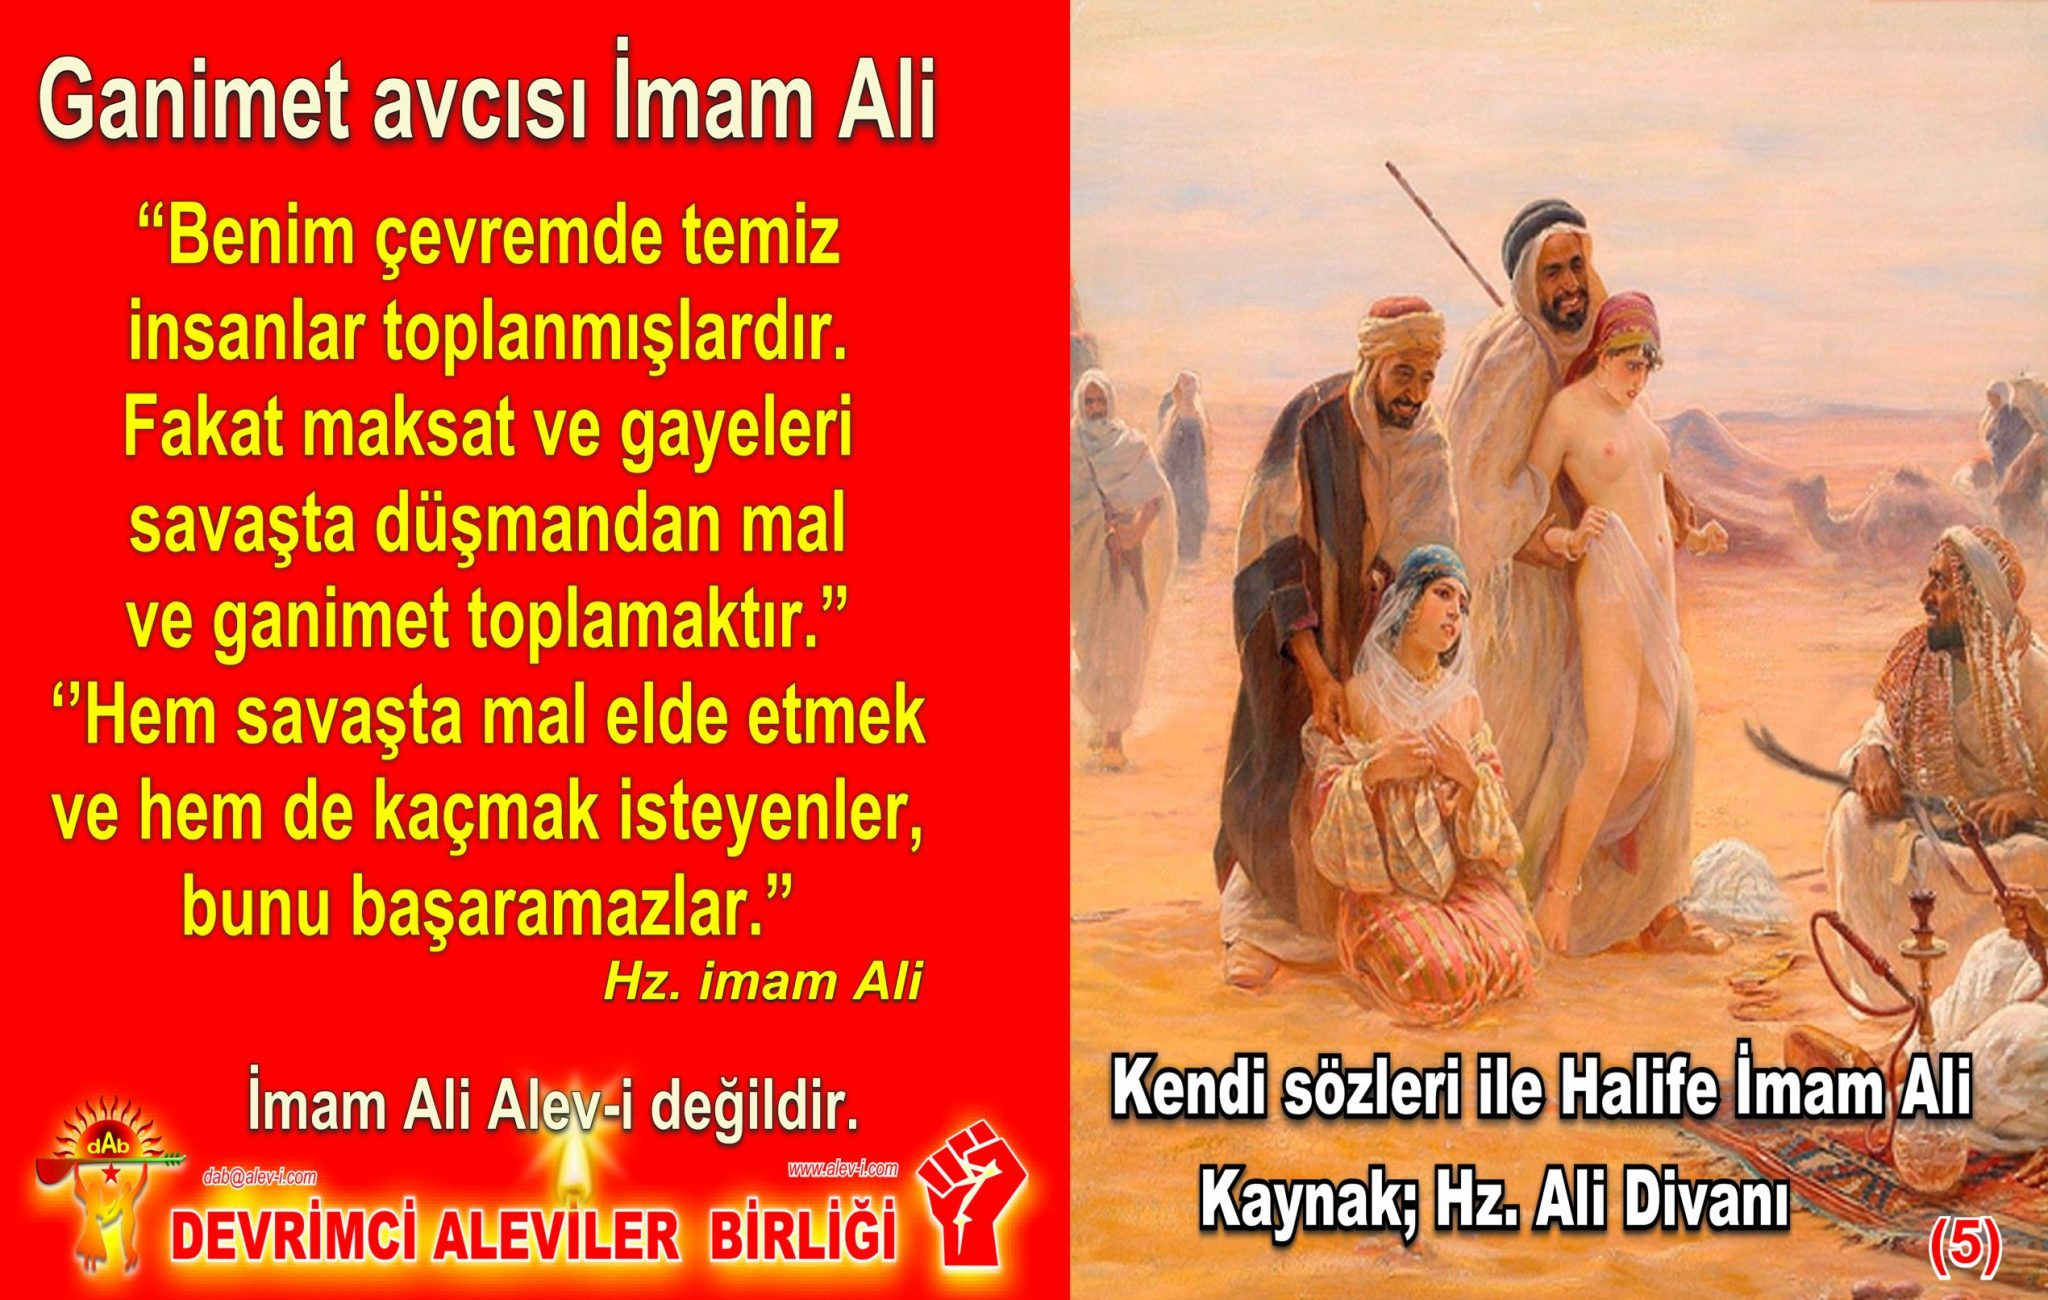 5 Hz imam Ali divani Alevi bektasi kizilbas pir sultan devrimci aleviler birligi DAB Feramuz Sah Acar